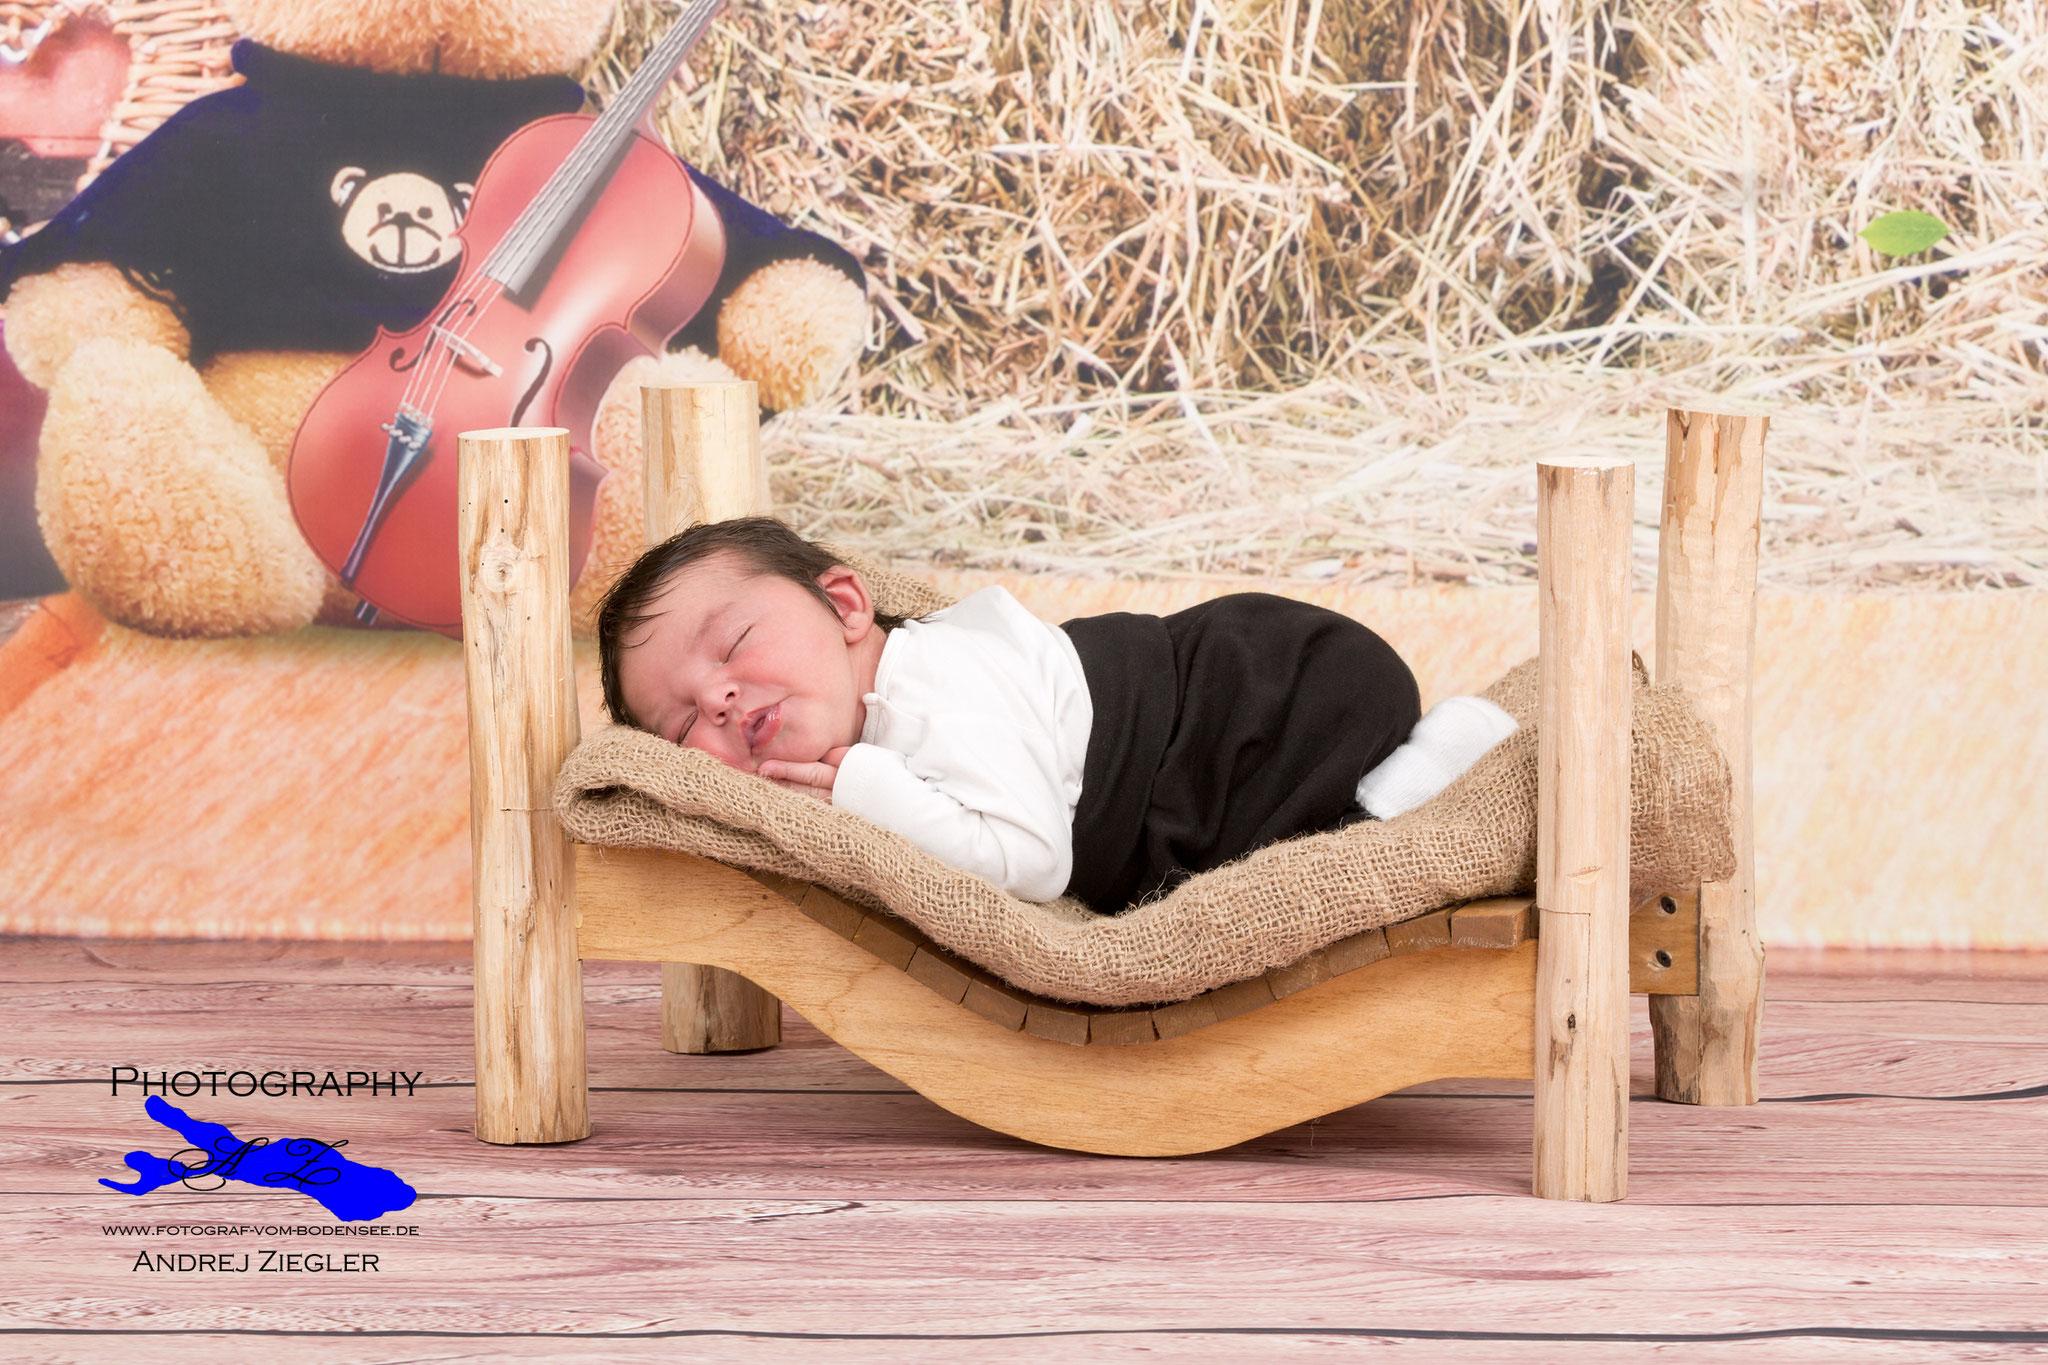 Neugeborenenbilder, Babyfotografie in Bad Saulgau